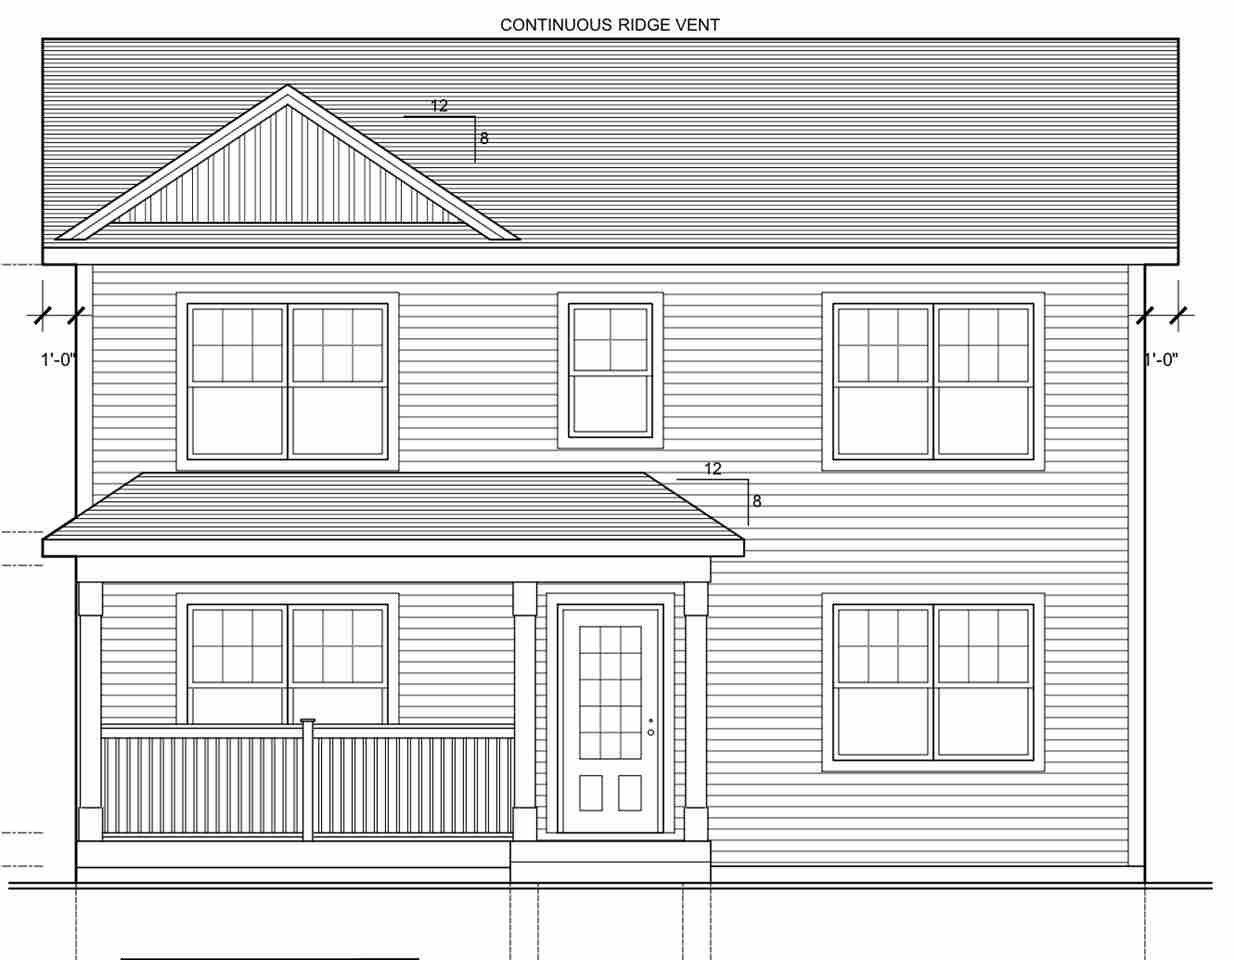 Main Photo: Lot 134 3 Yew Street in Hammonds Plains: 21-Kingswood, Haliburton Hills, Hammonds Pl. Residential for sale (Halifax-Dartmouth)  : MLS®# 201924704